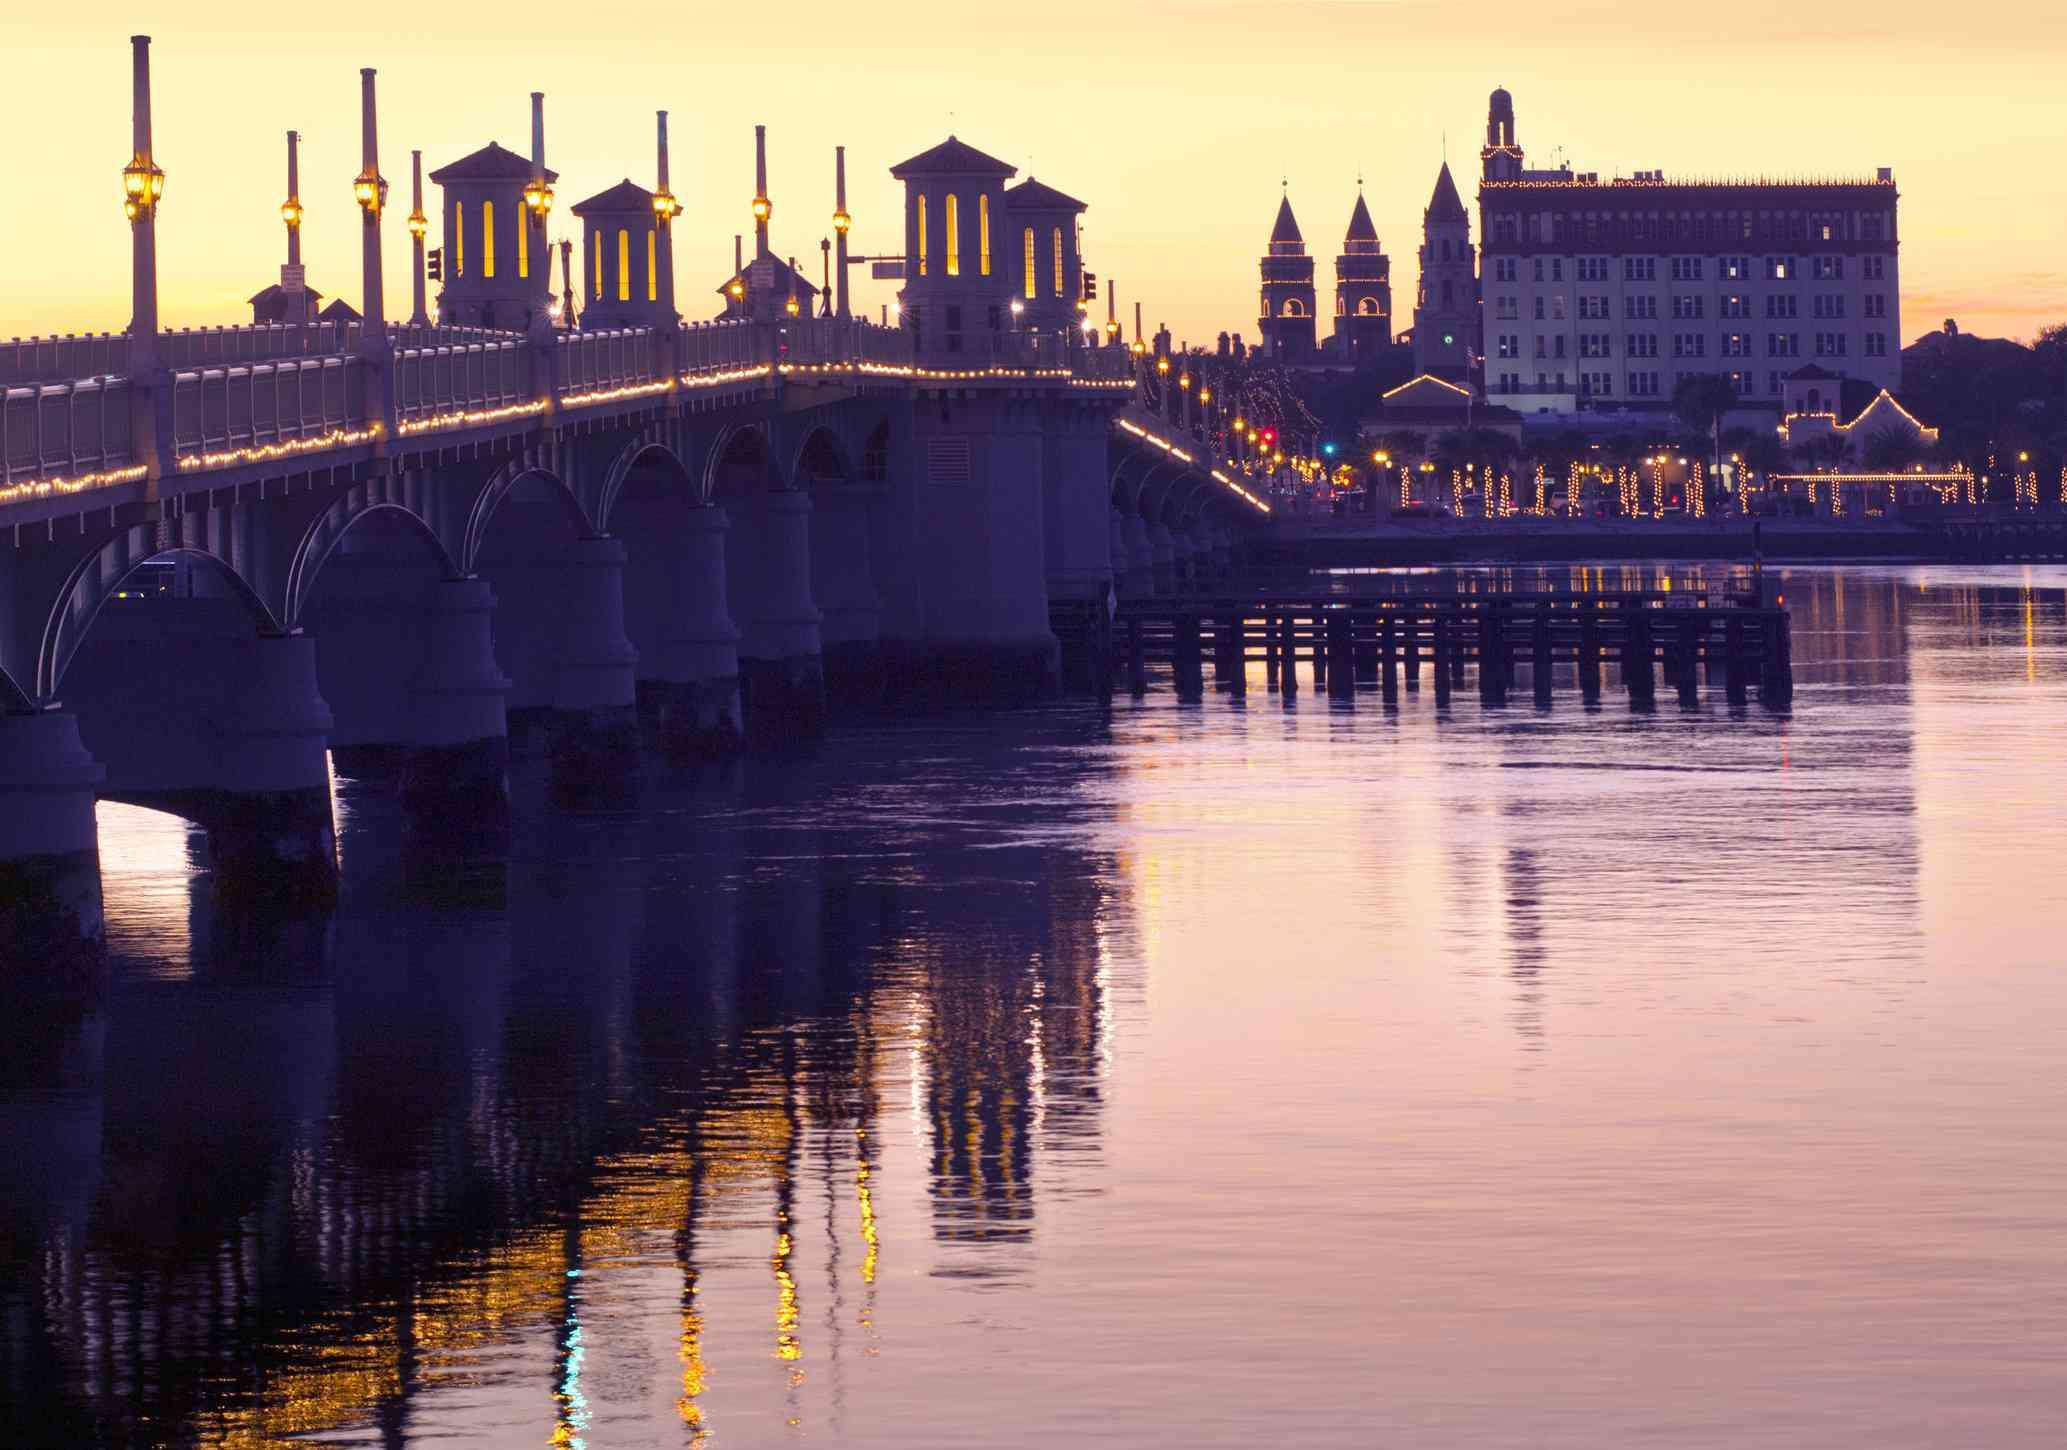 The Bridge of Lions illuminated tower piers